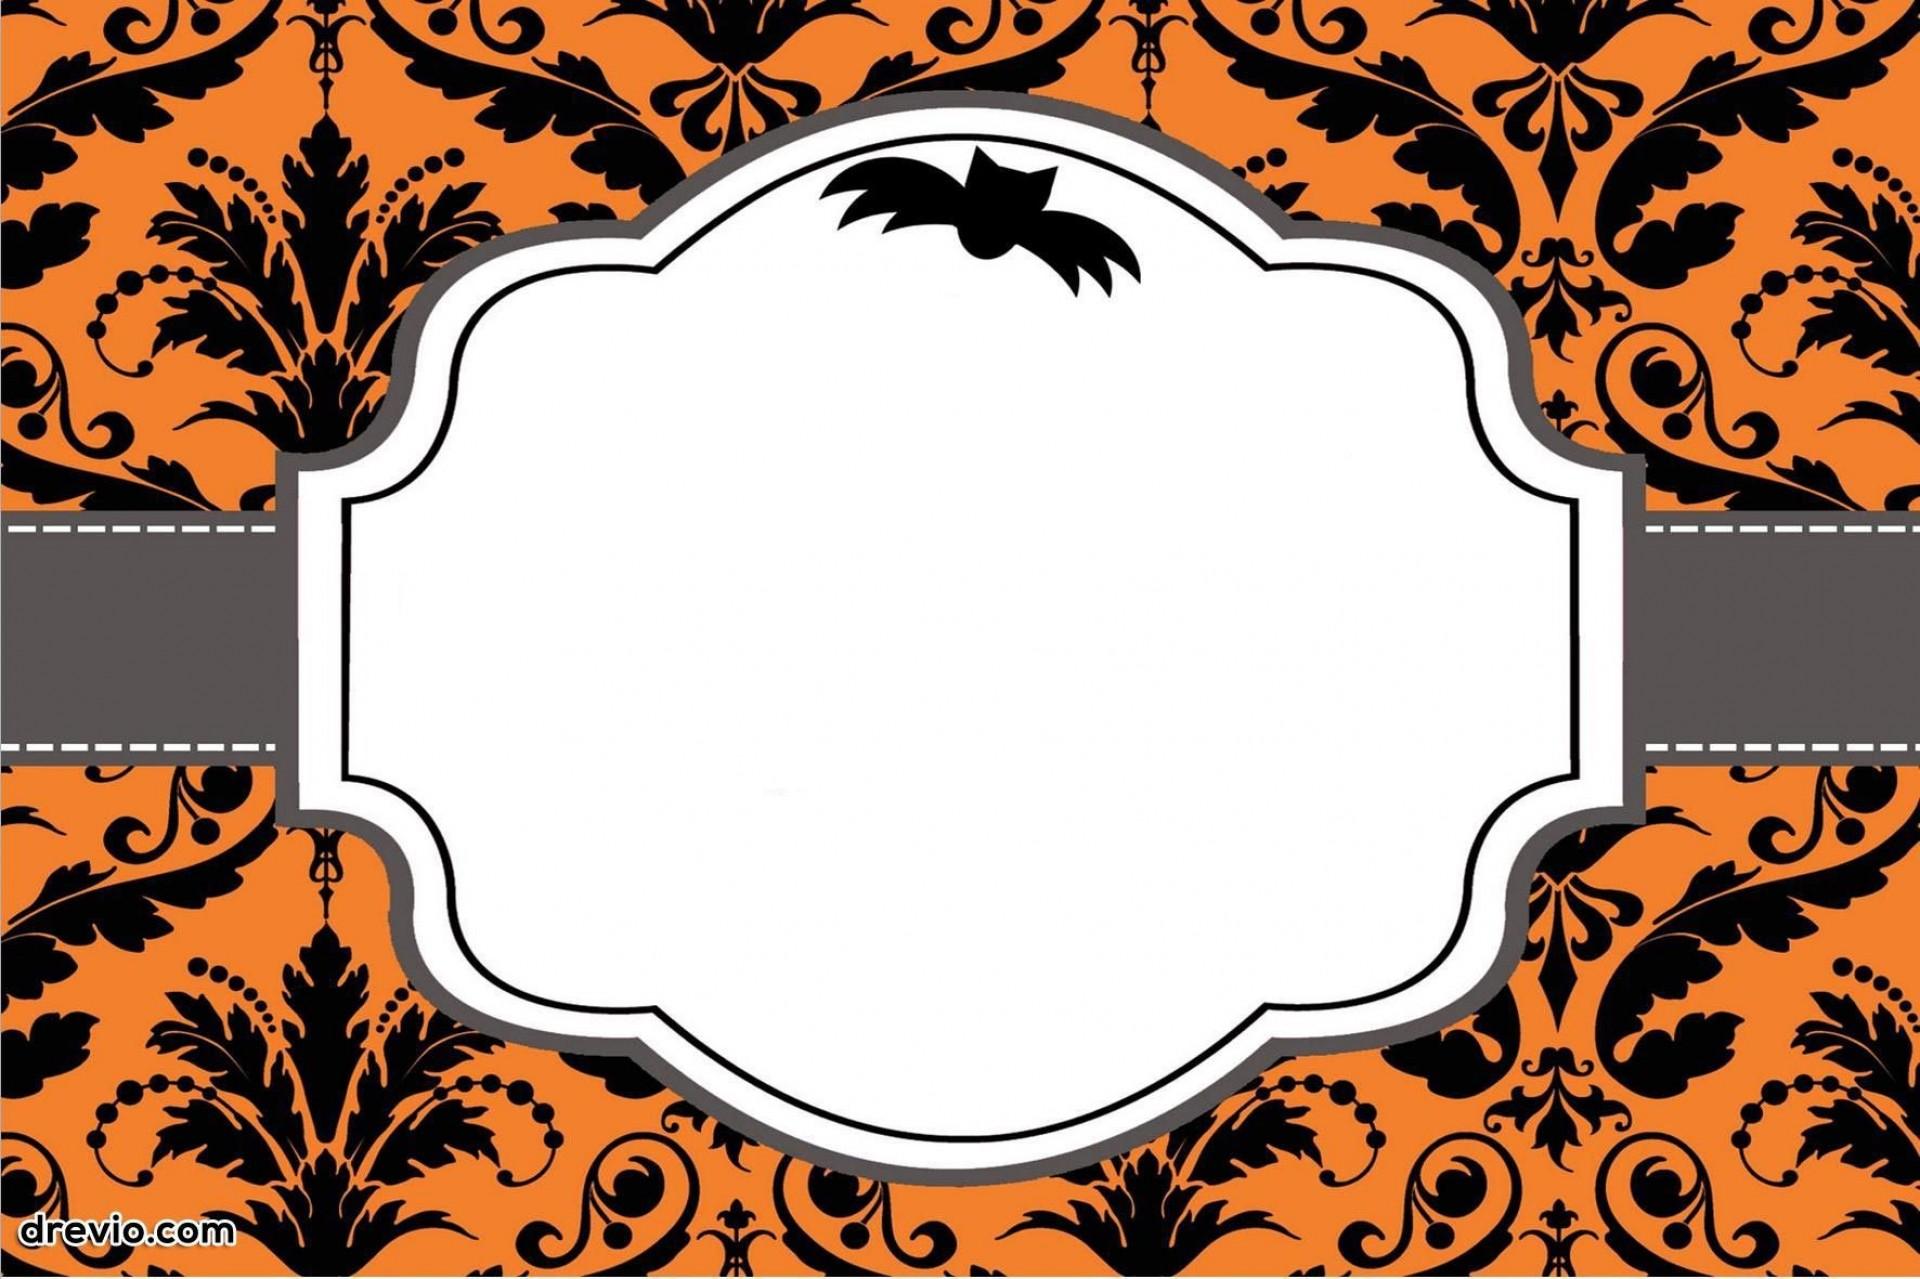 003 Surprising Free Halloween Invitation Template Design  Templates Online Printable Birthday Party Wedding1920